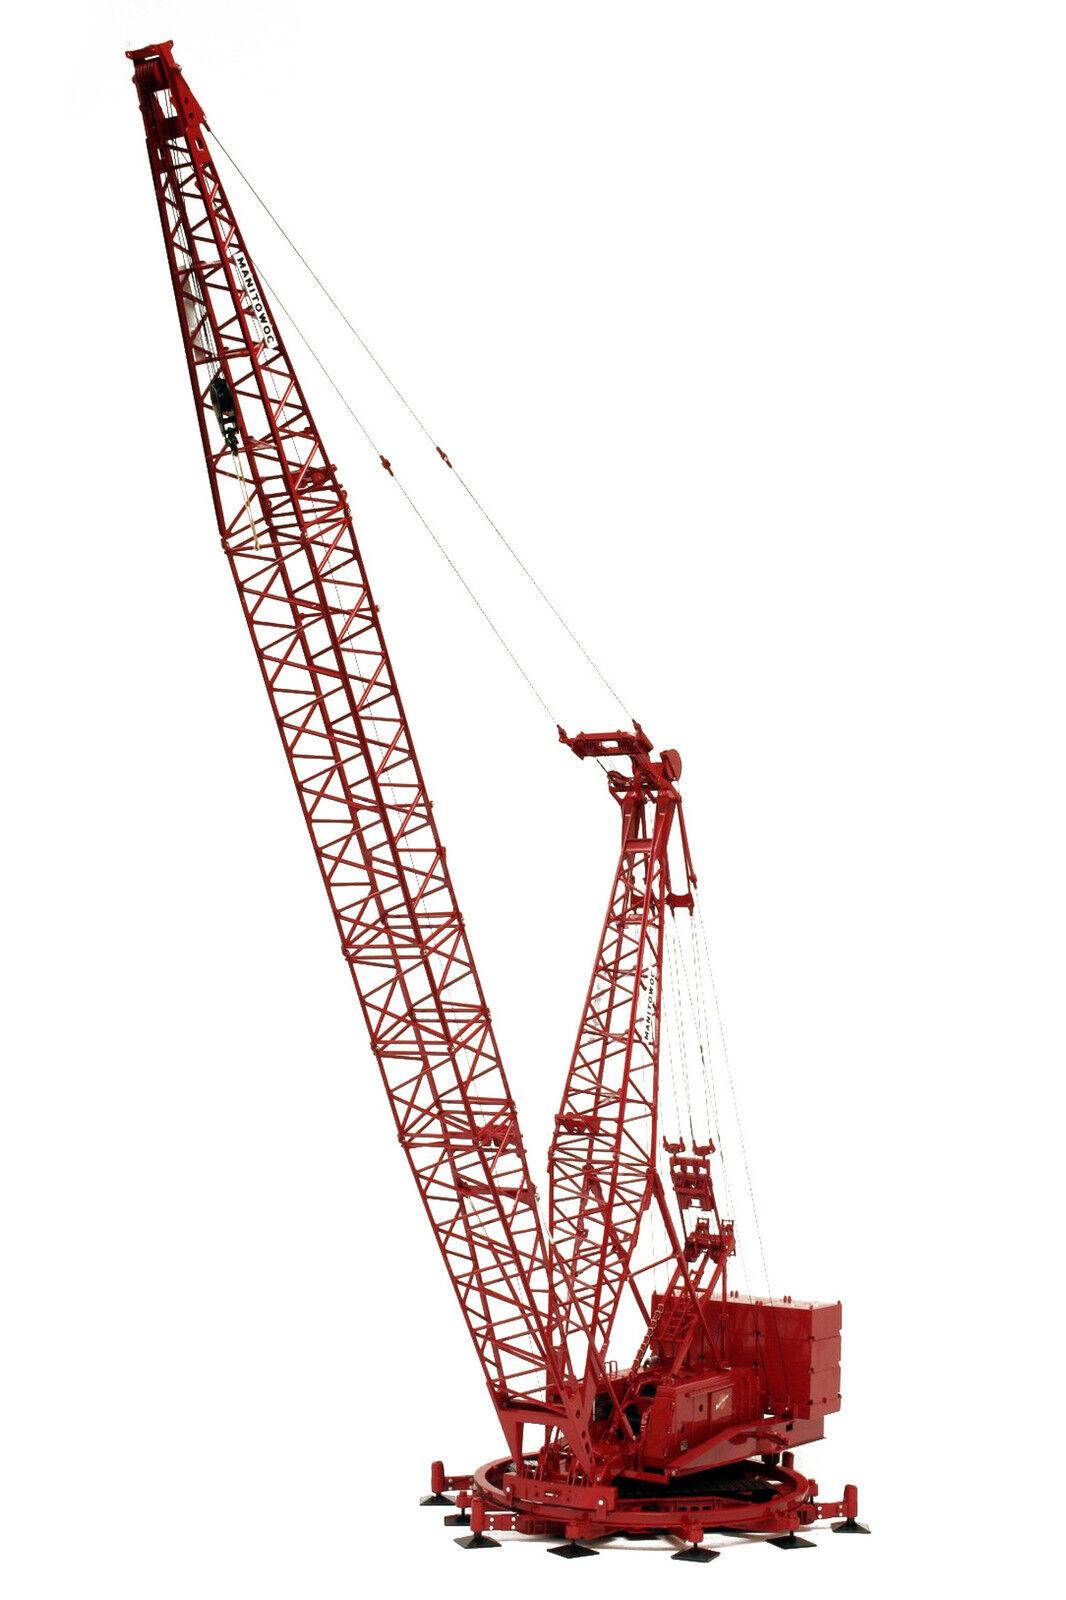 MANITOWOC 4100 W Ringer Crane & kit d'extension - 1 50 - TWH  051-01041 & 051B-0112